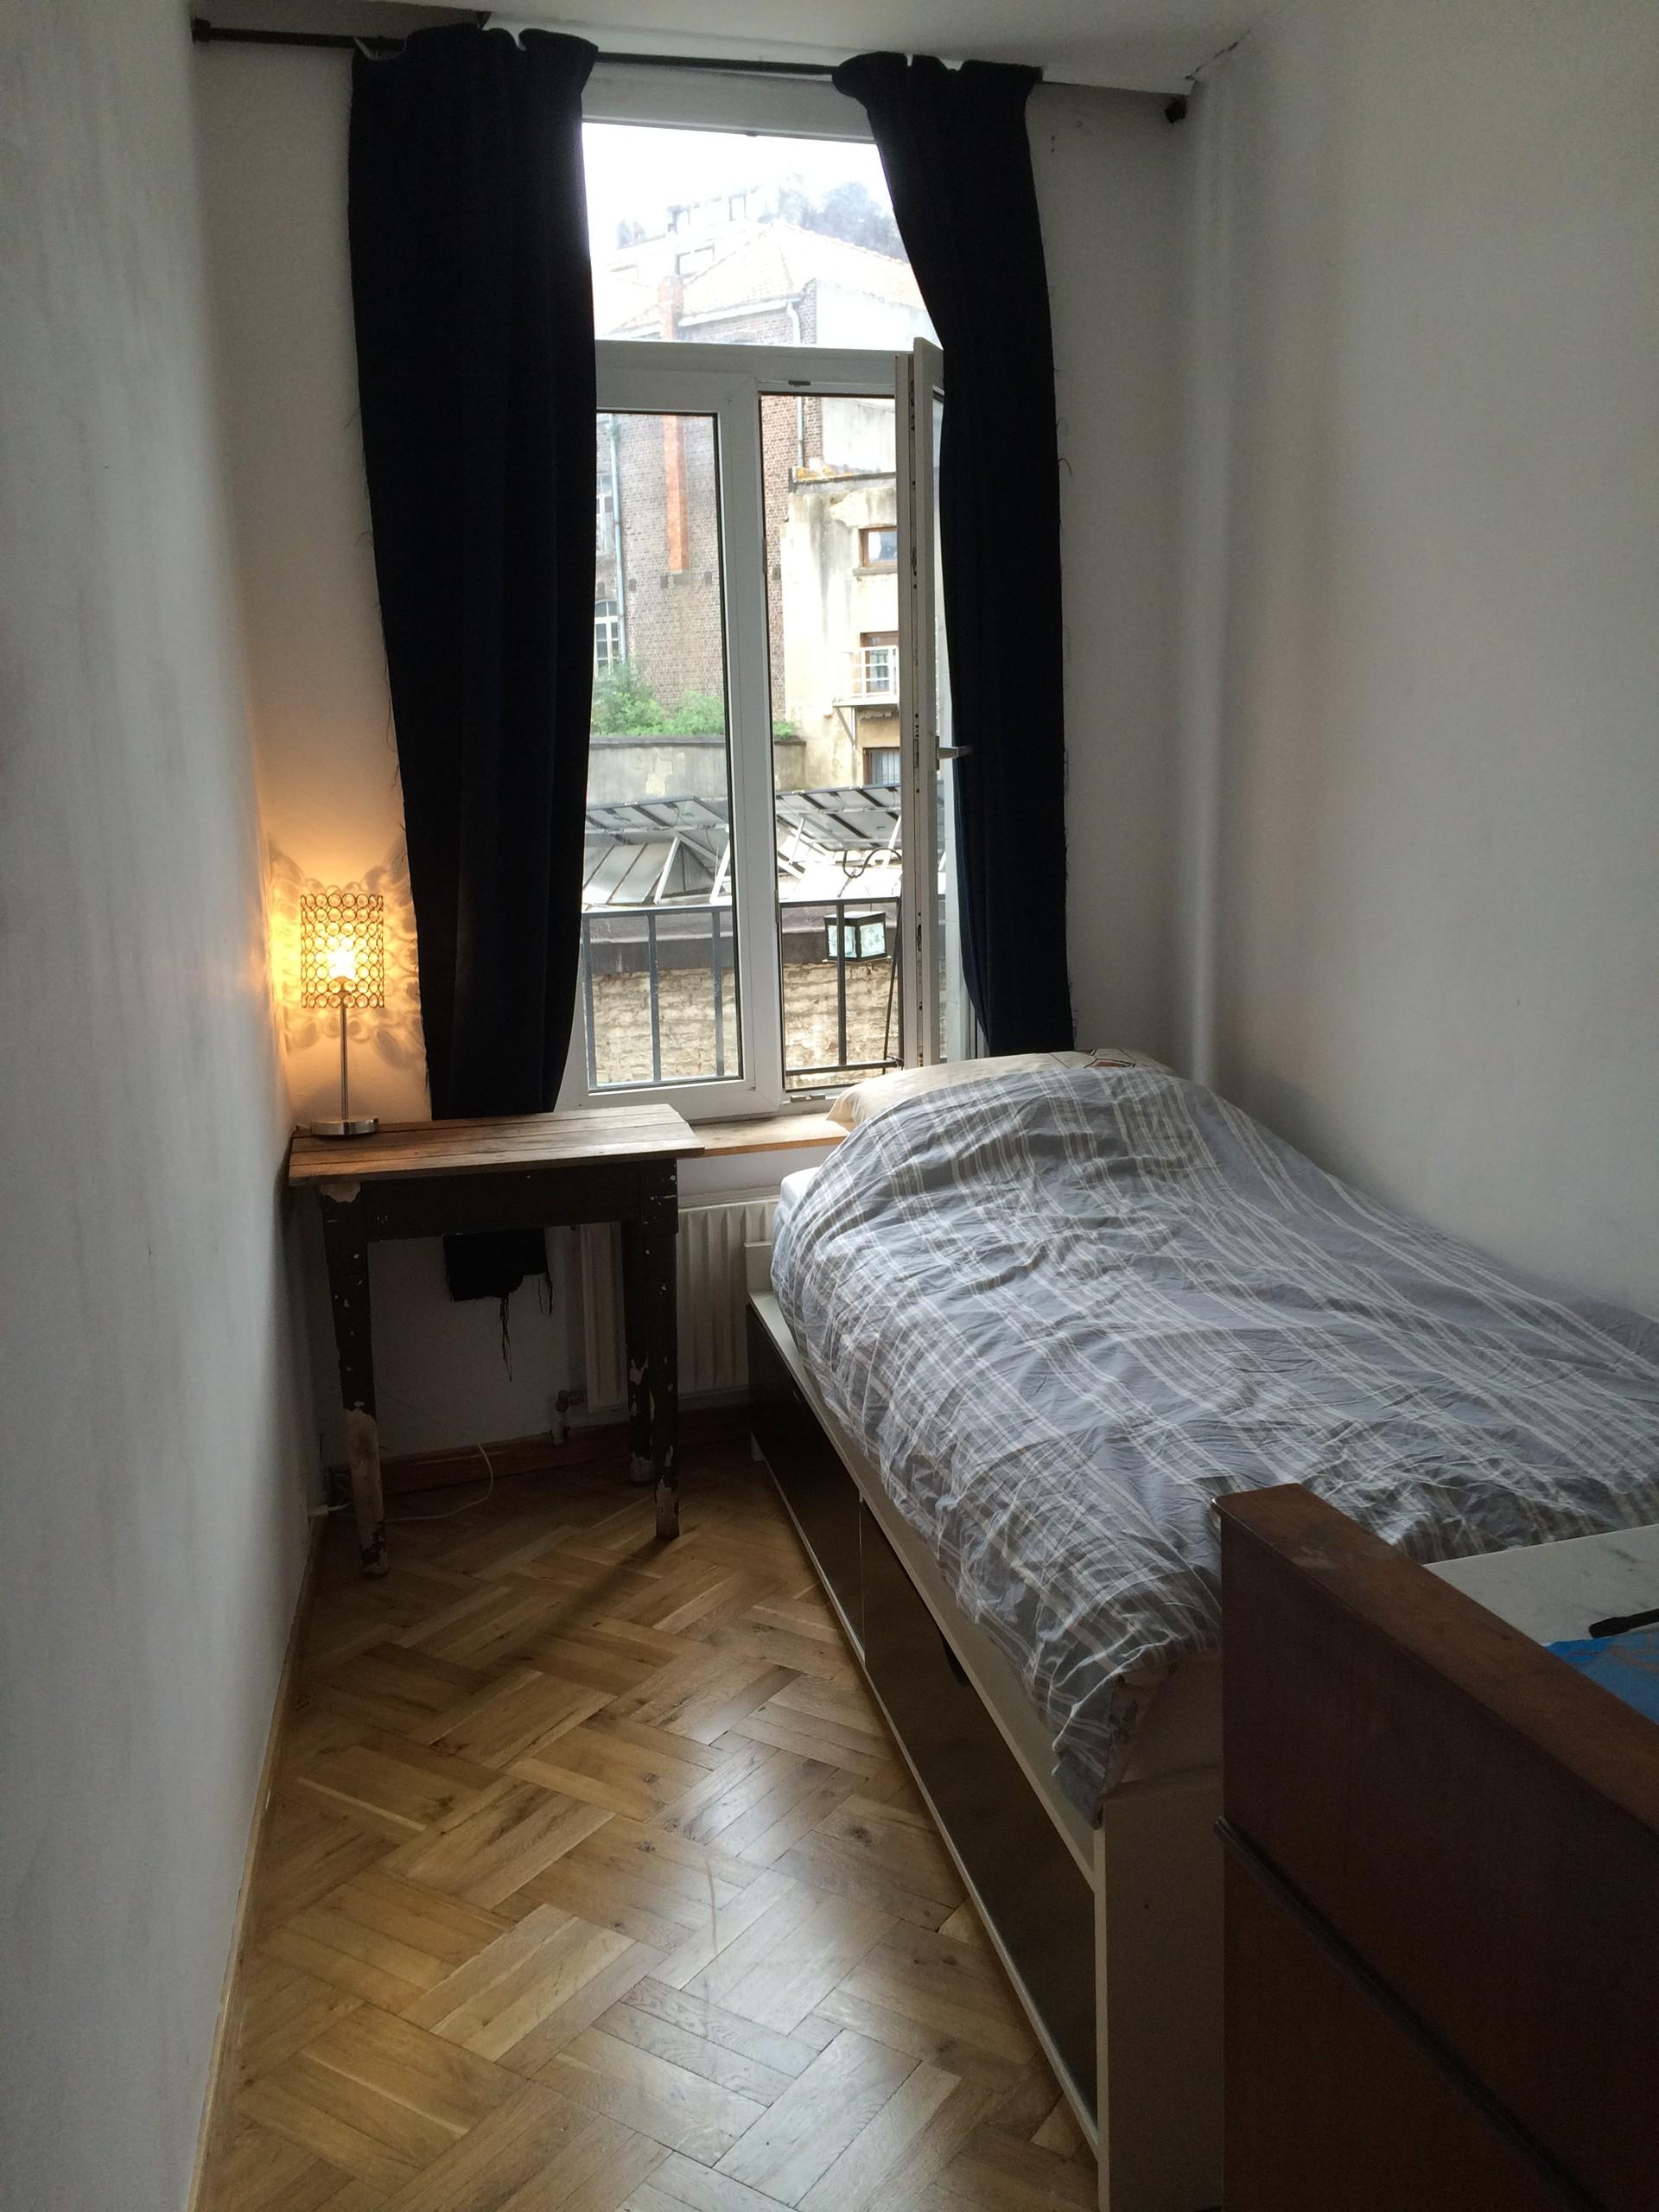 Petite chambre  louer  Saint Gilles Room to rent